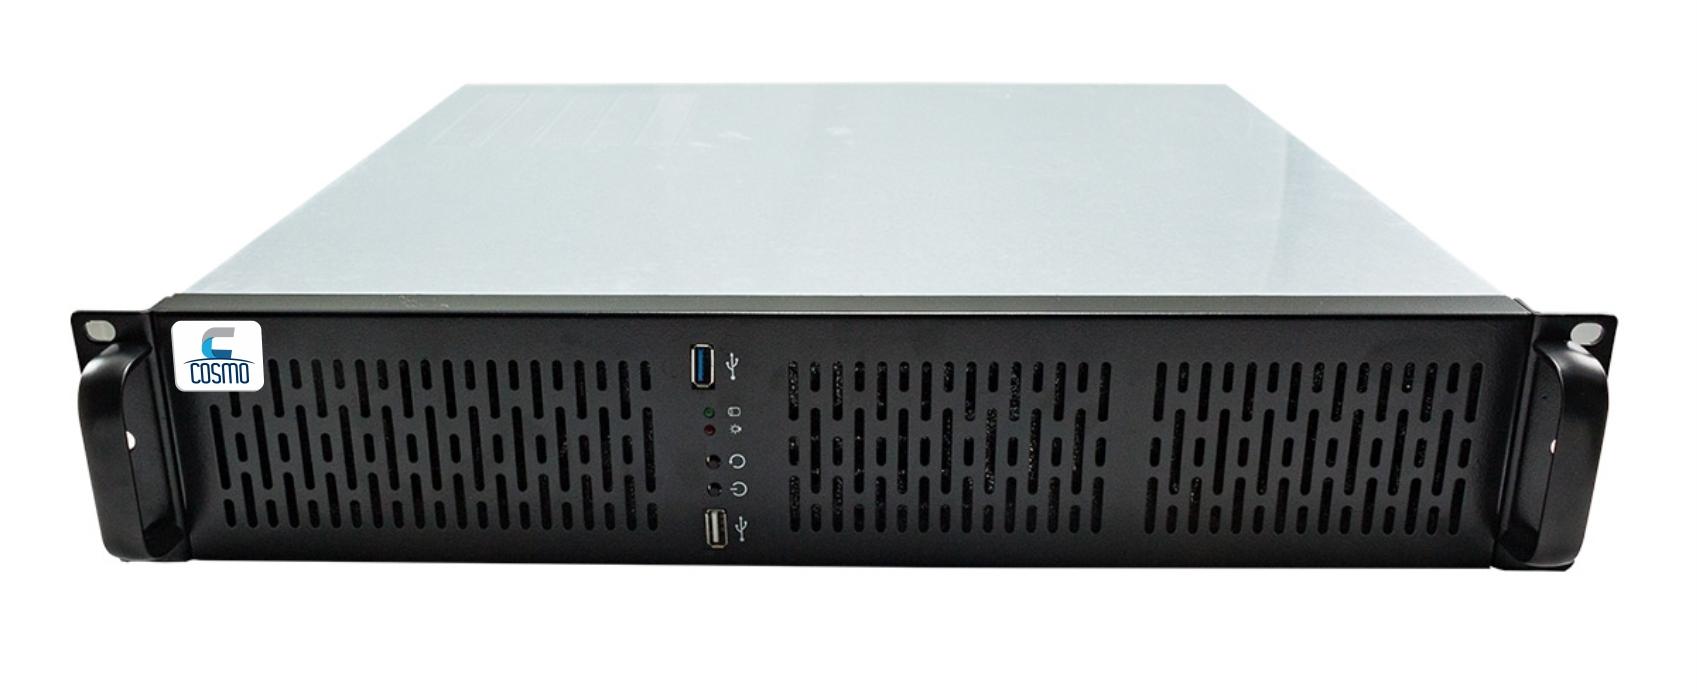 COSMO Server 2U